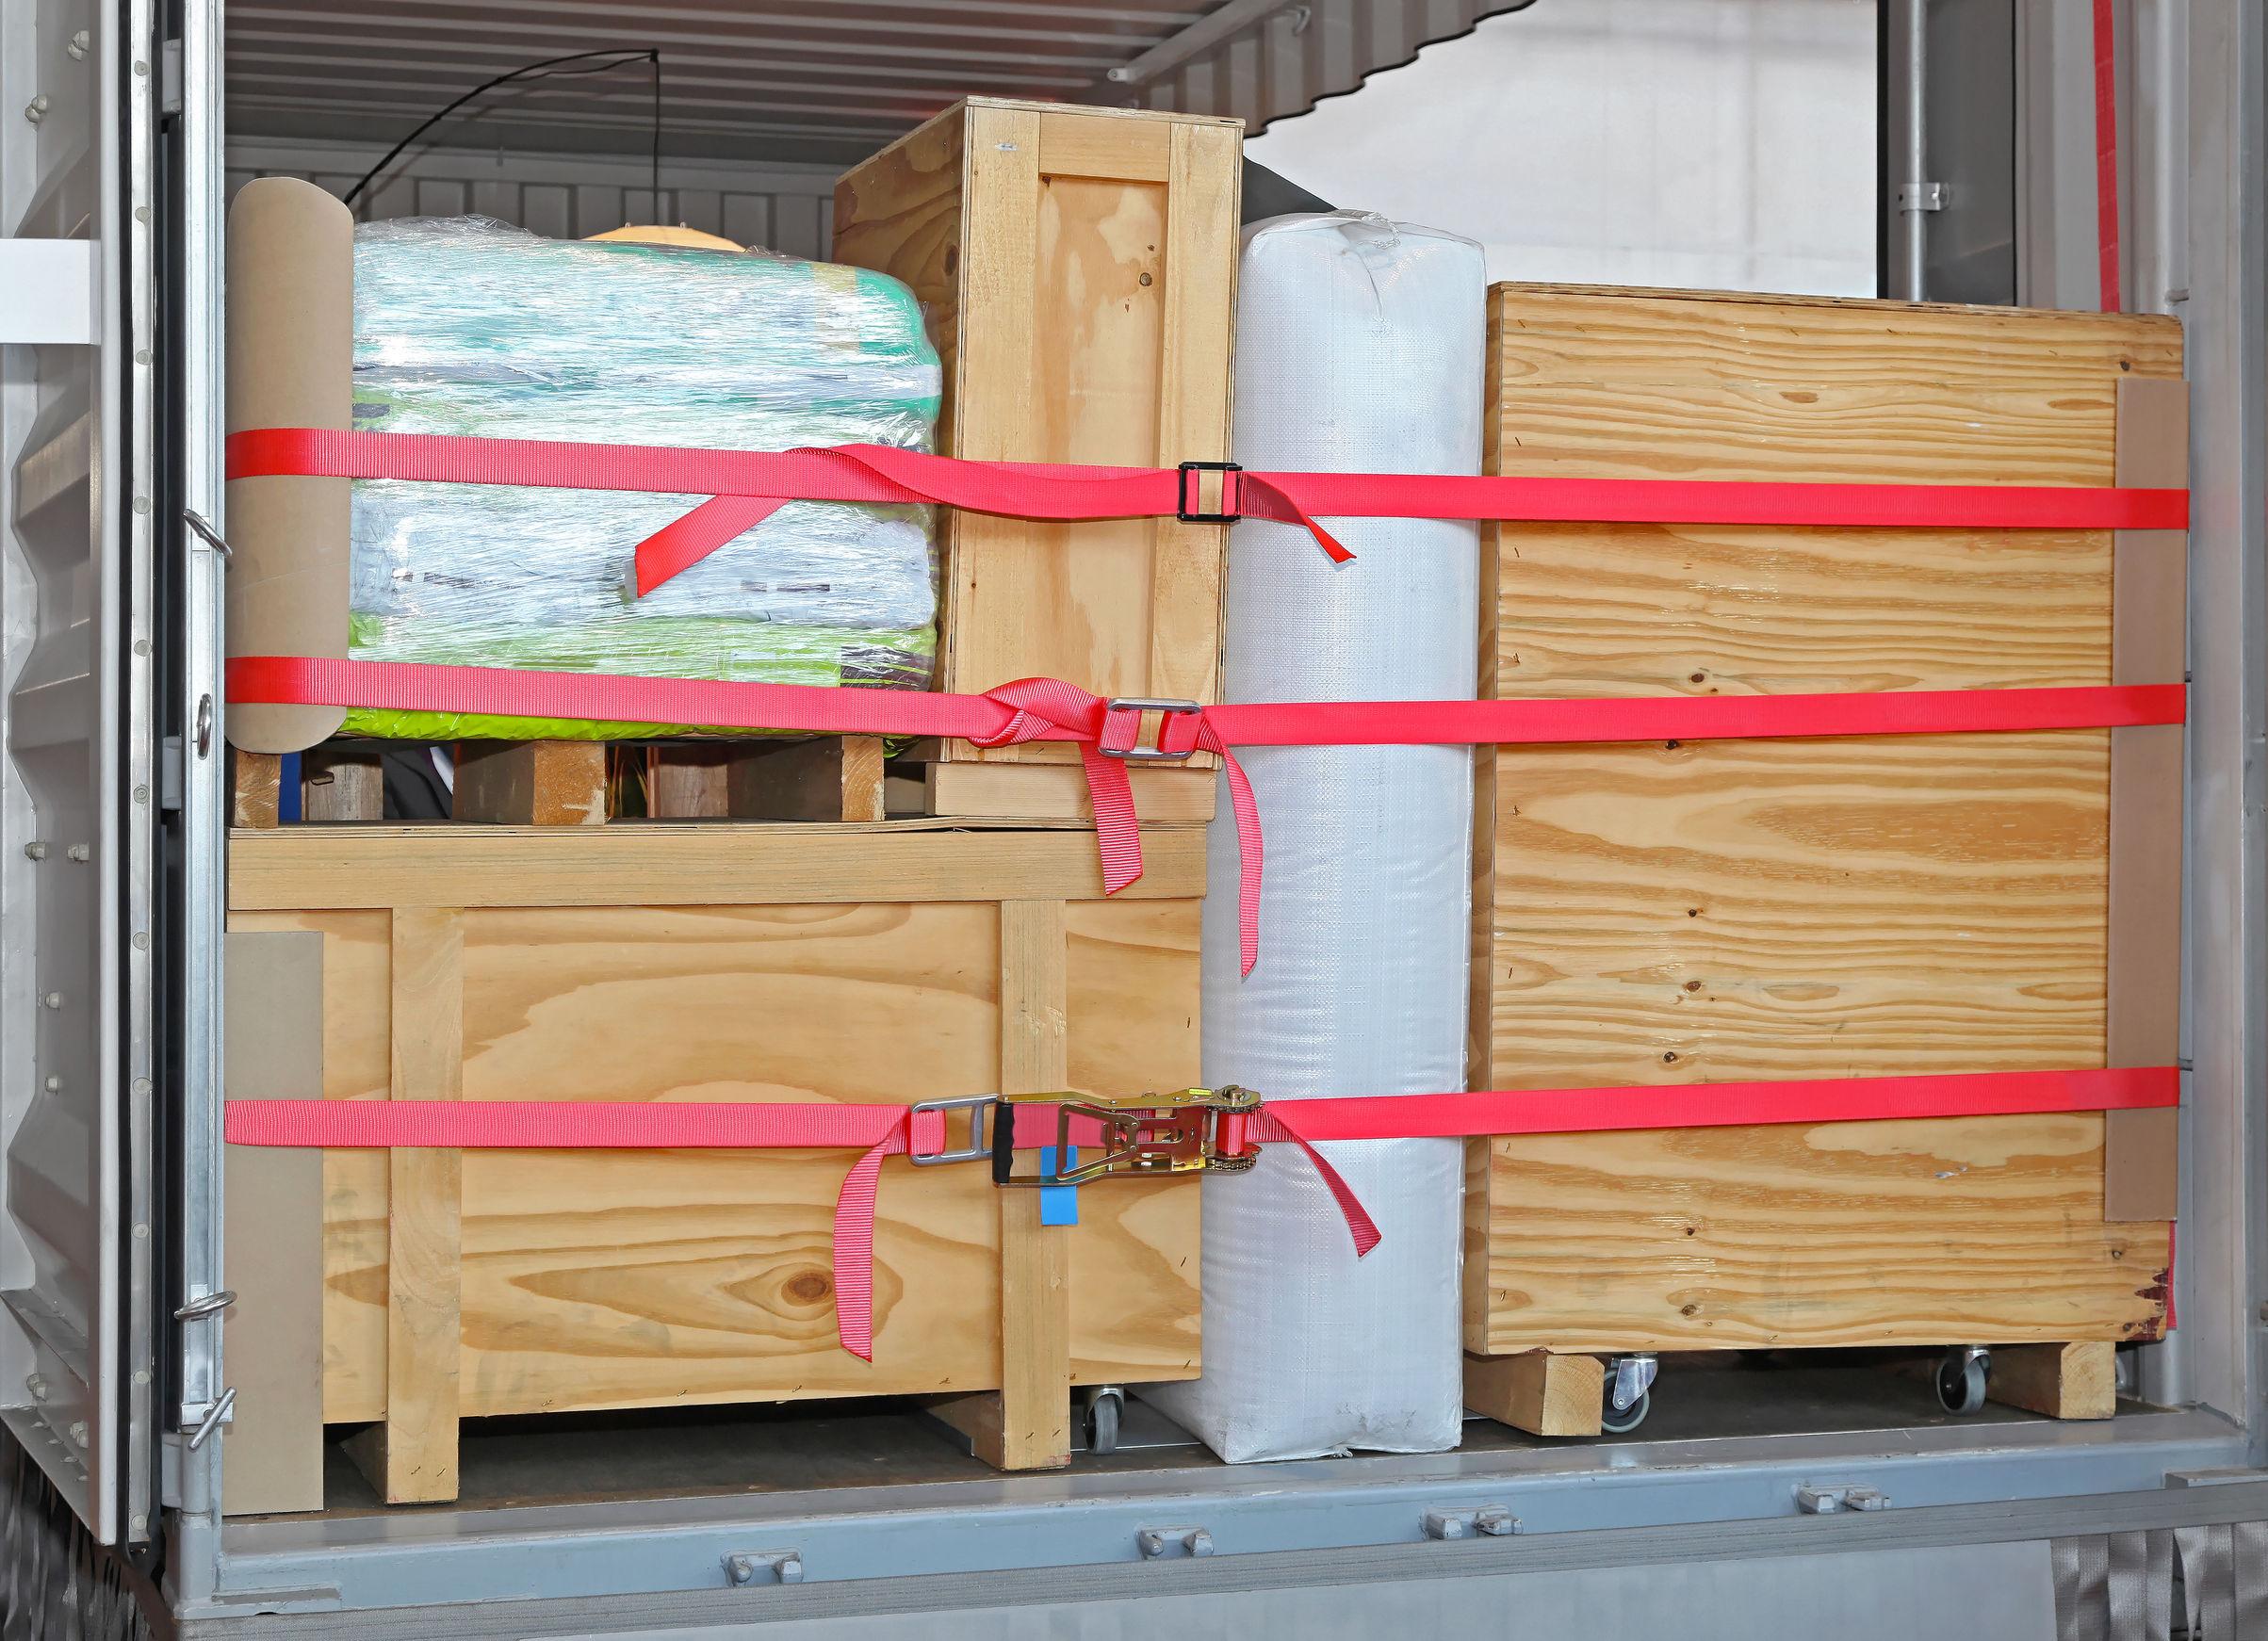 Storage in transit